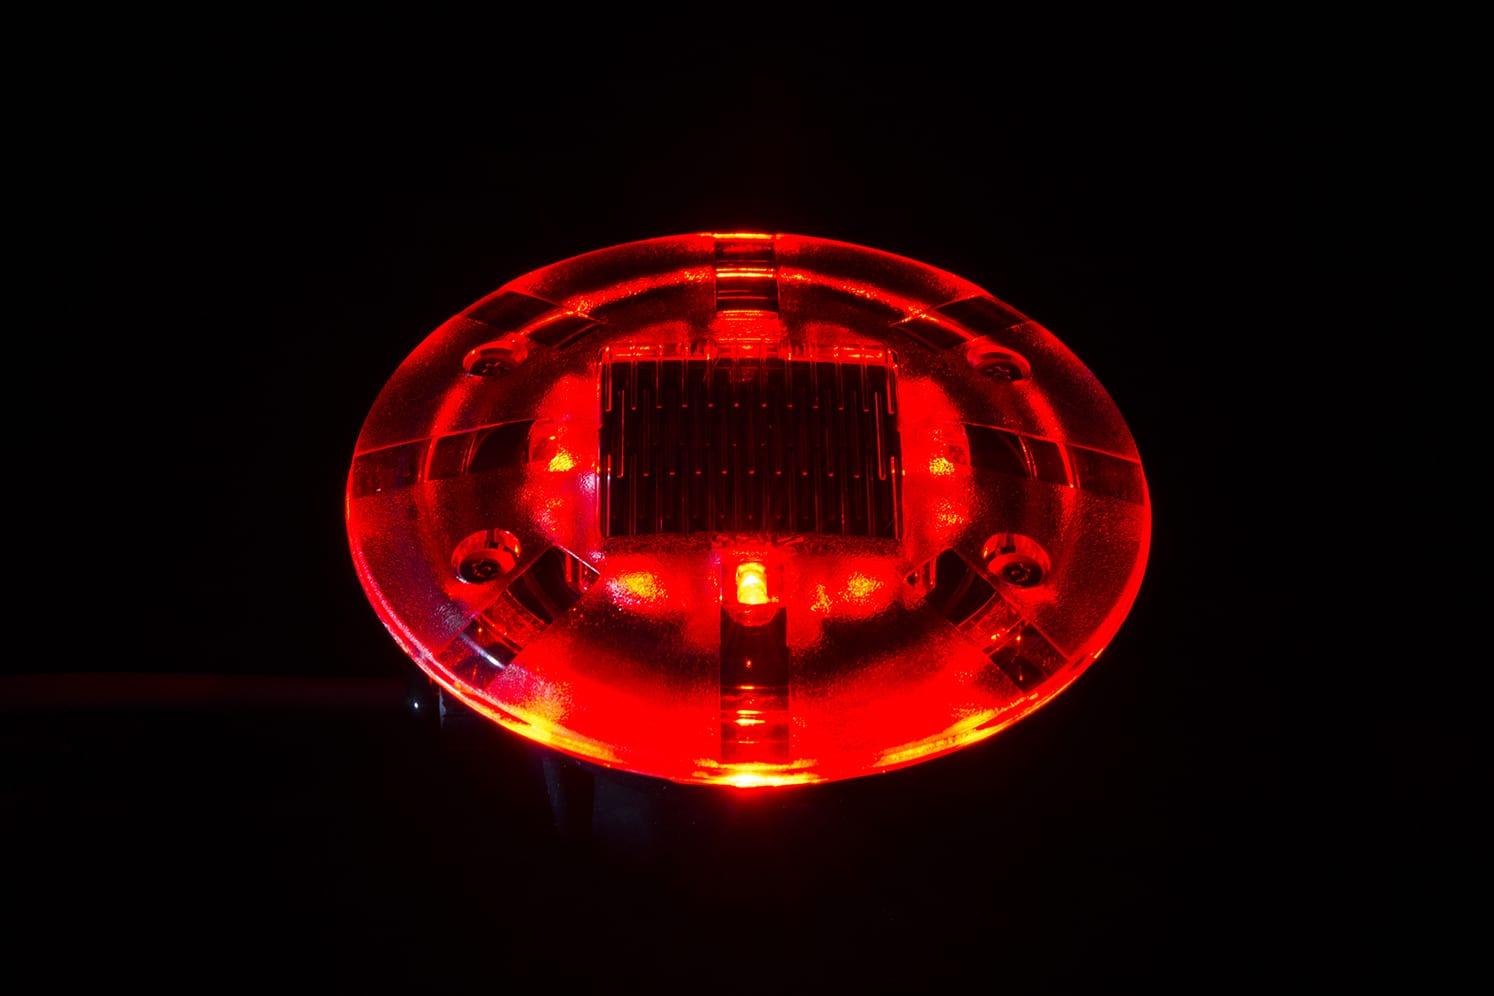 Plot lumineux Architecture et Urbanisme ECO-835 rouge